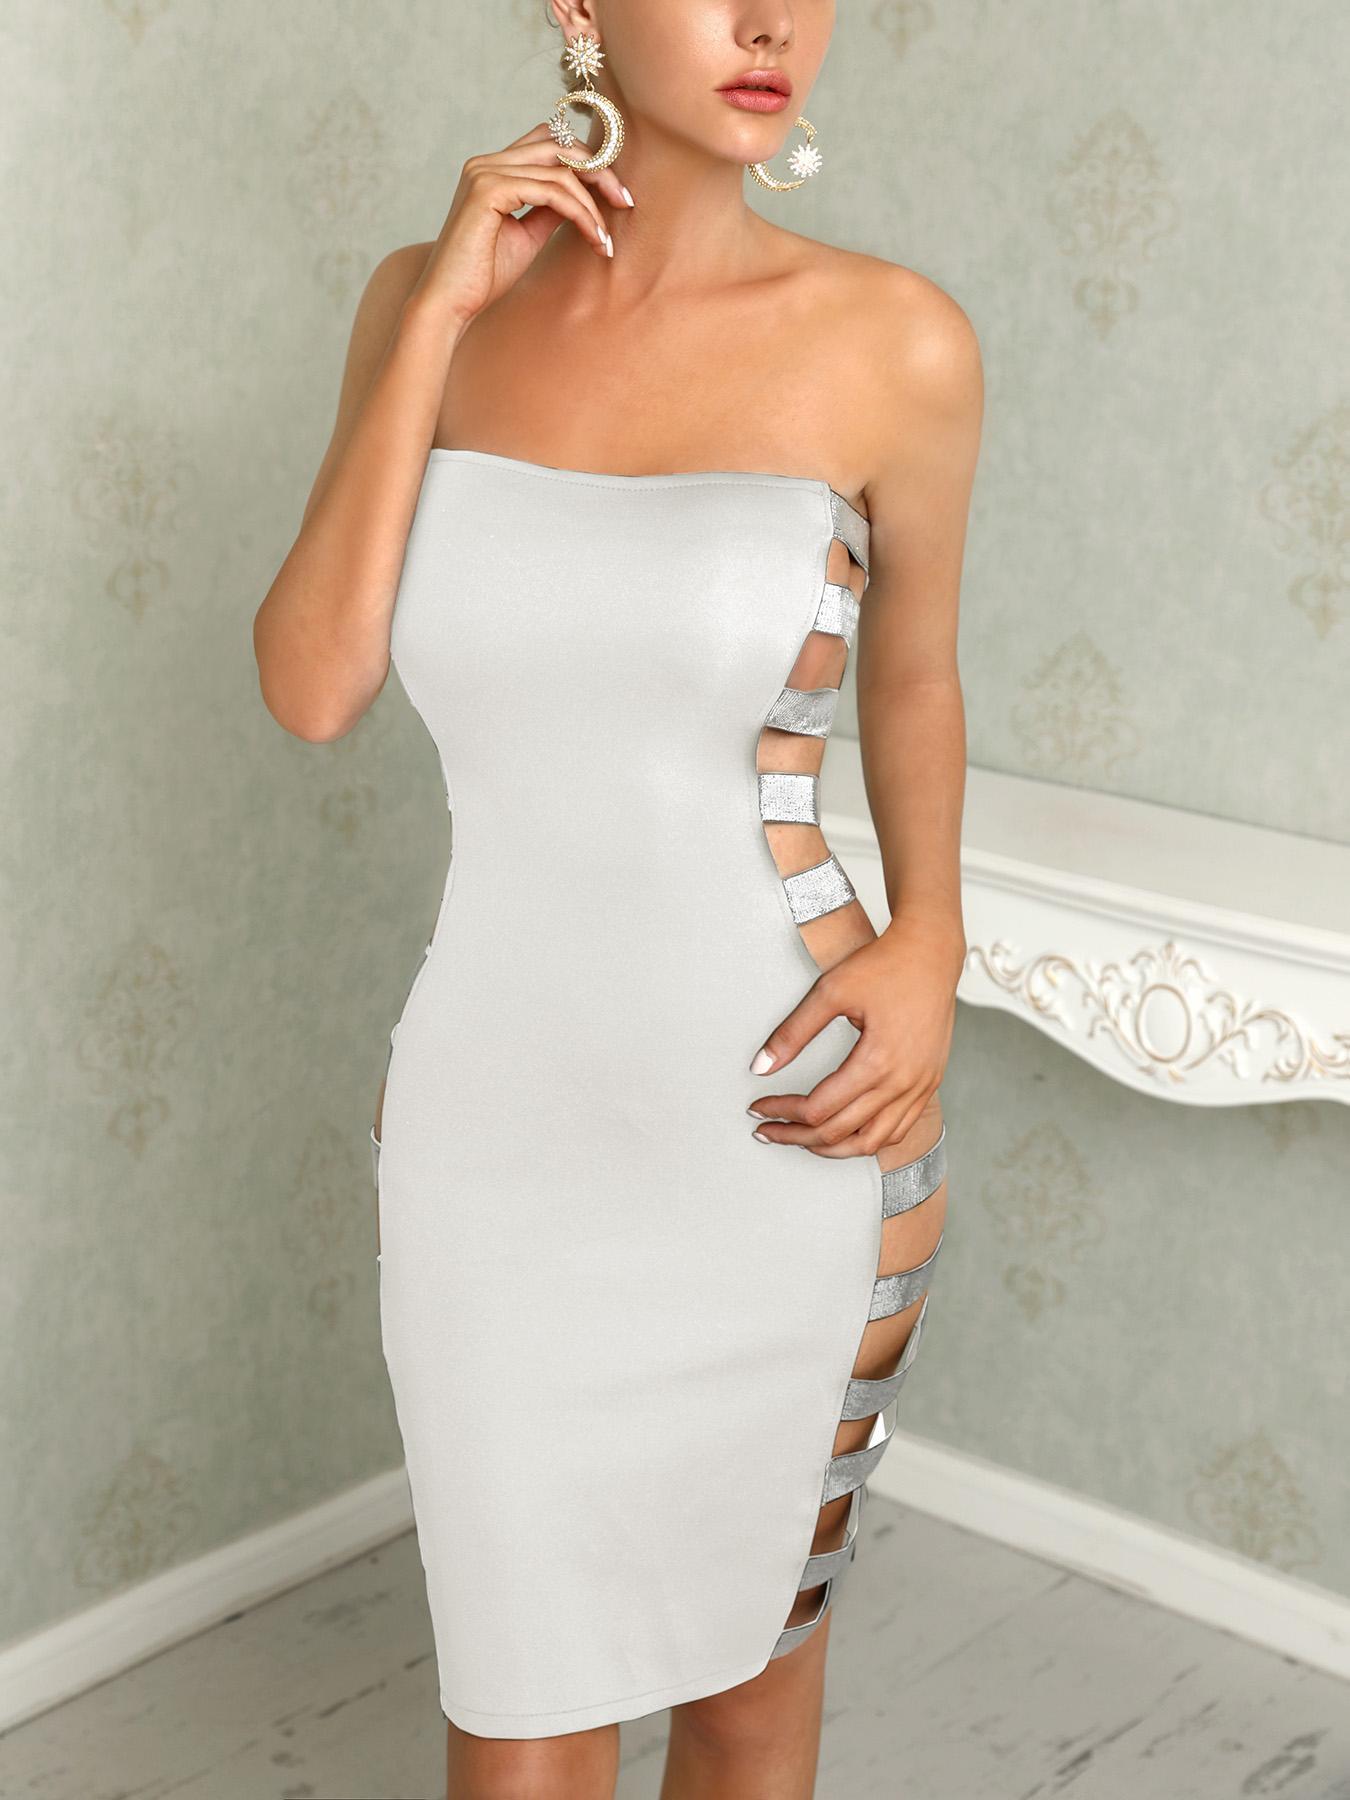 boutiquefeel / Mini vestido sin mangas con abertura en lentejuelas